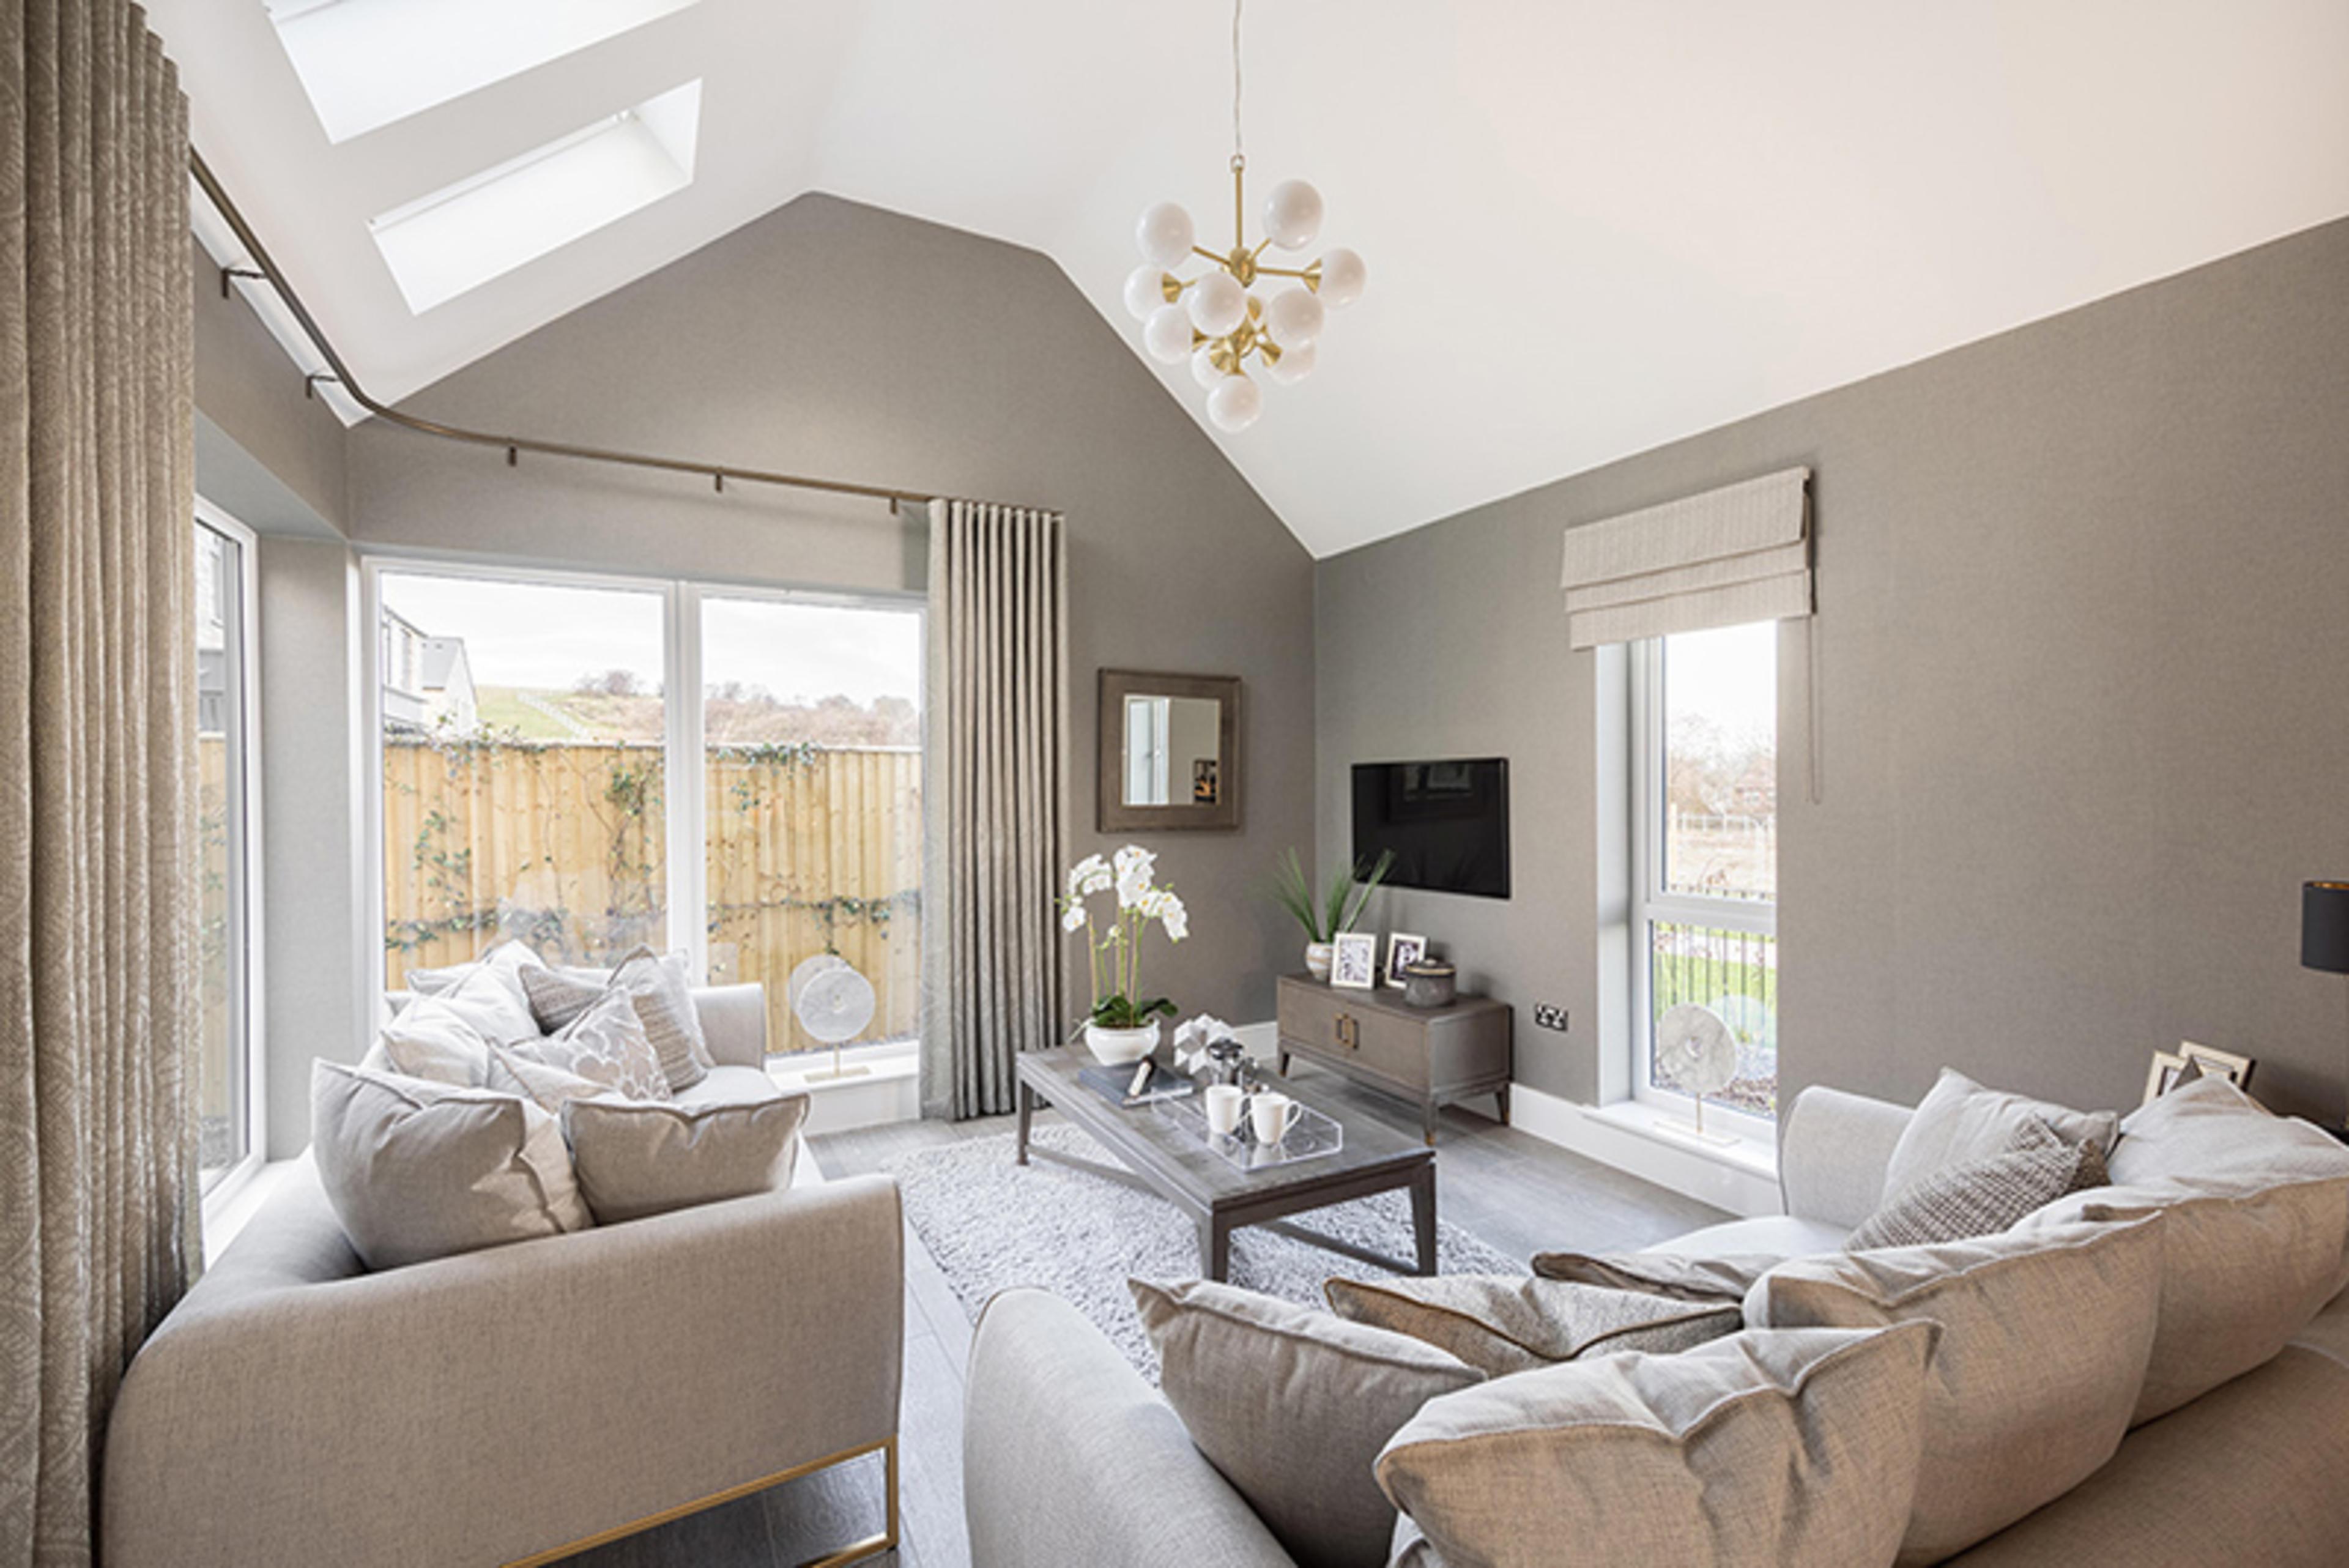 watling-grange-harrogate-merevale-4-bed-home-rear-living-room-1